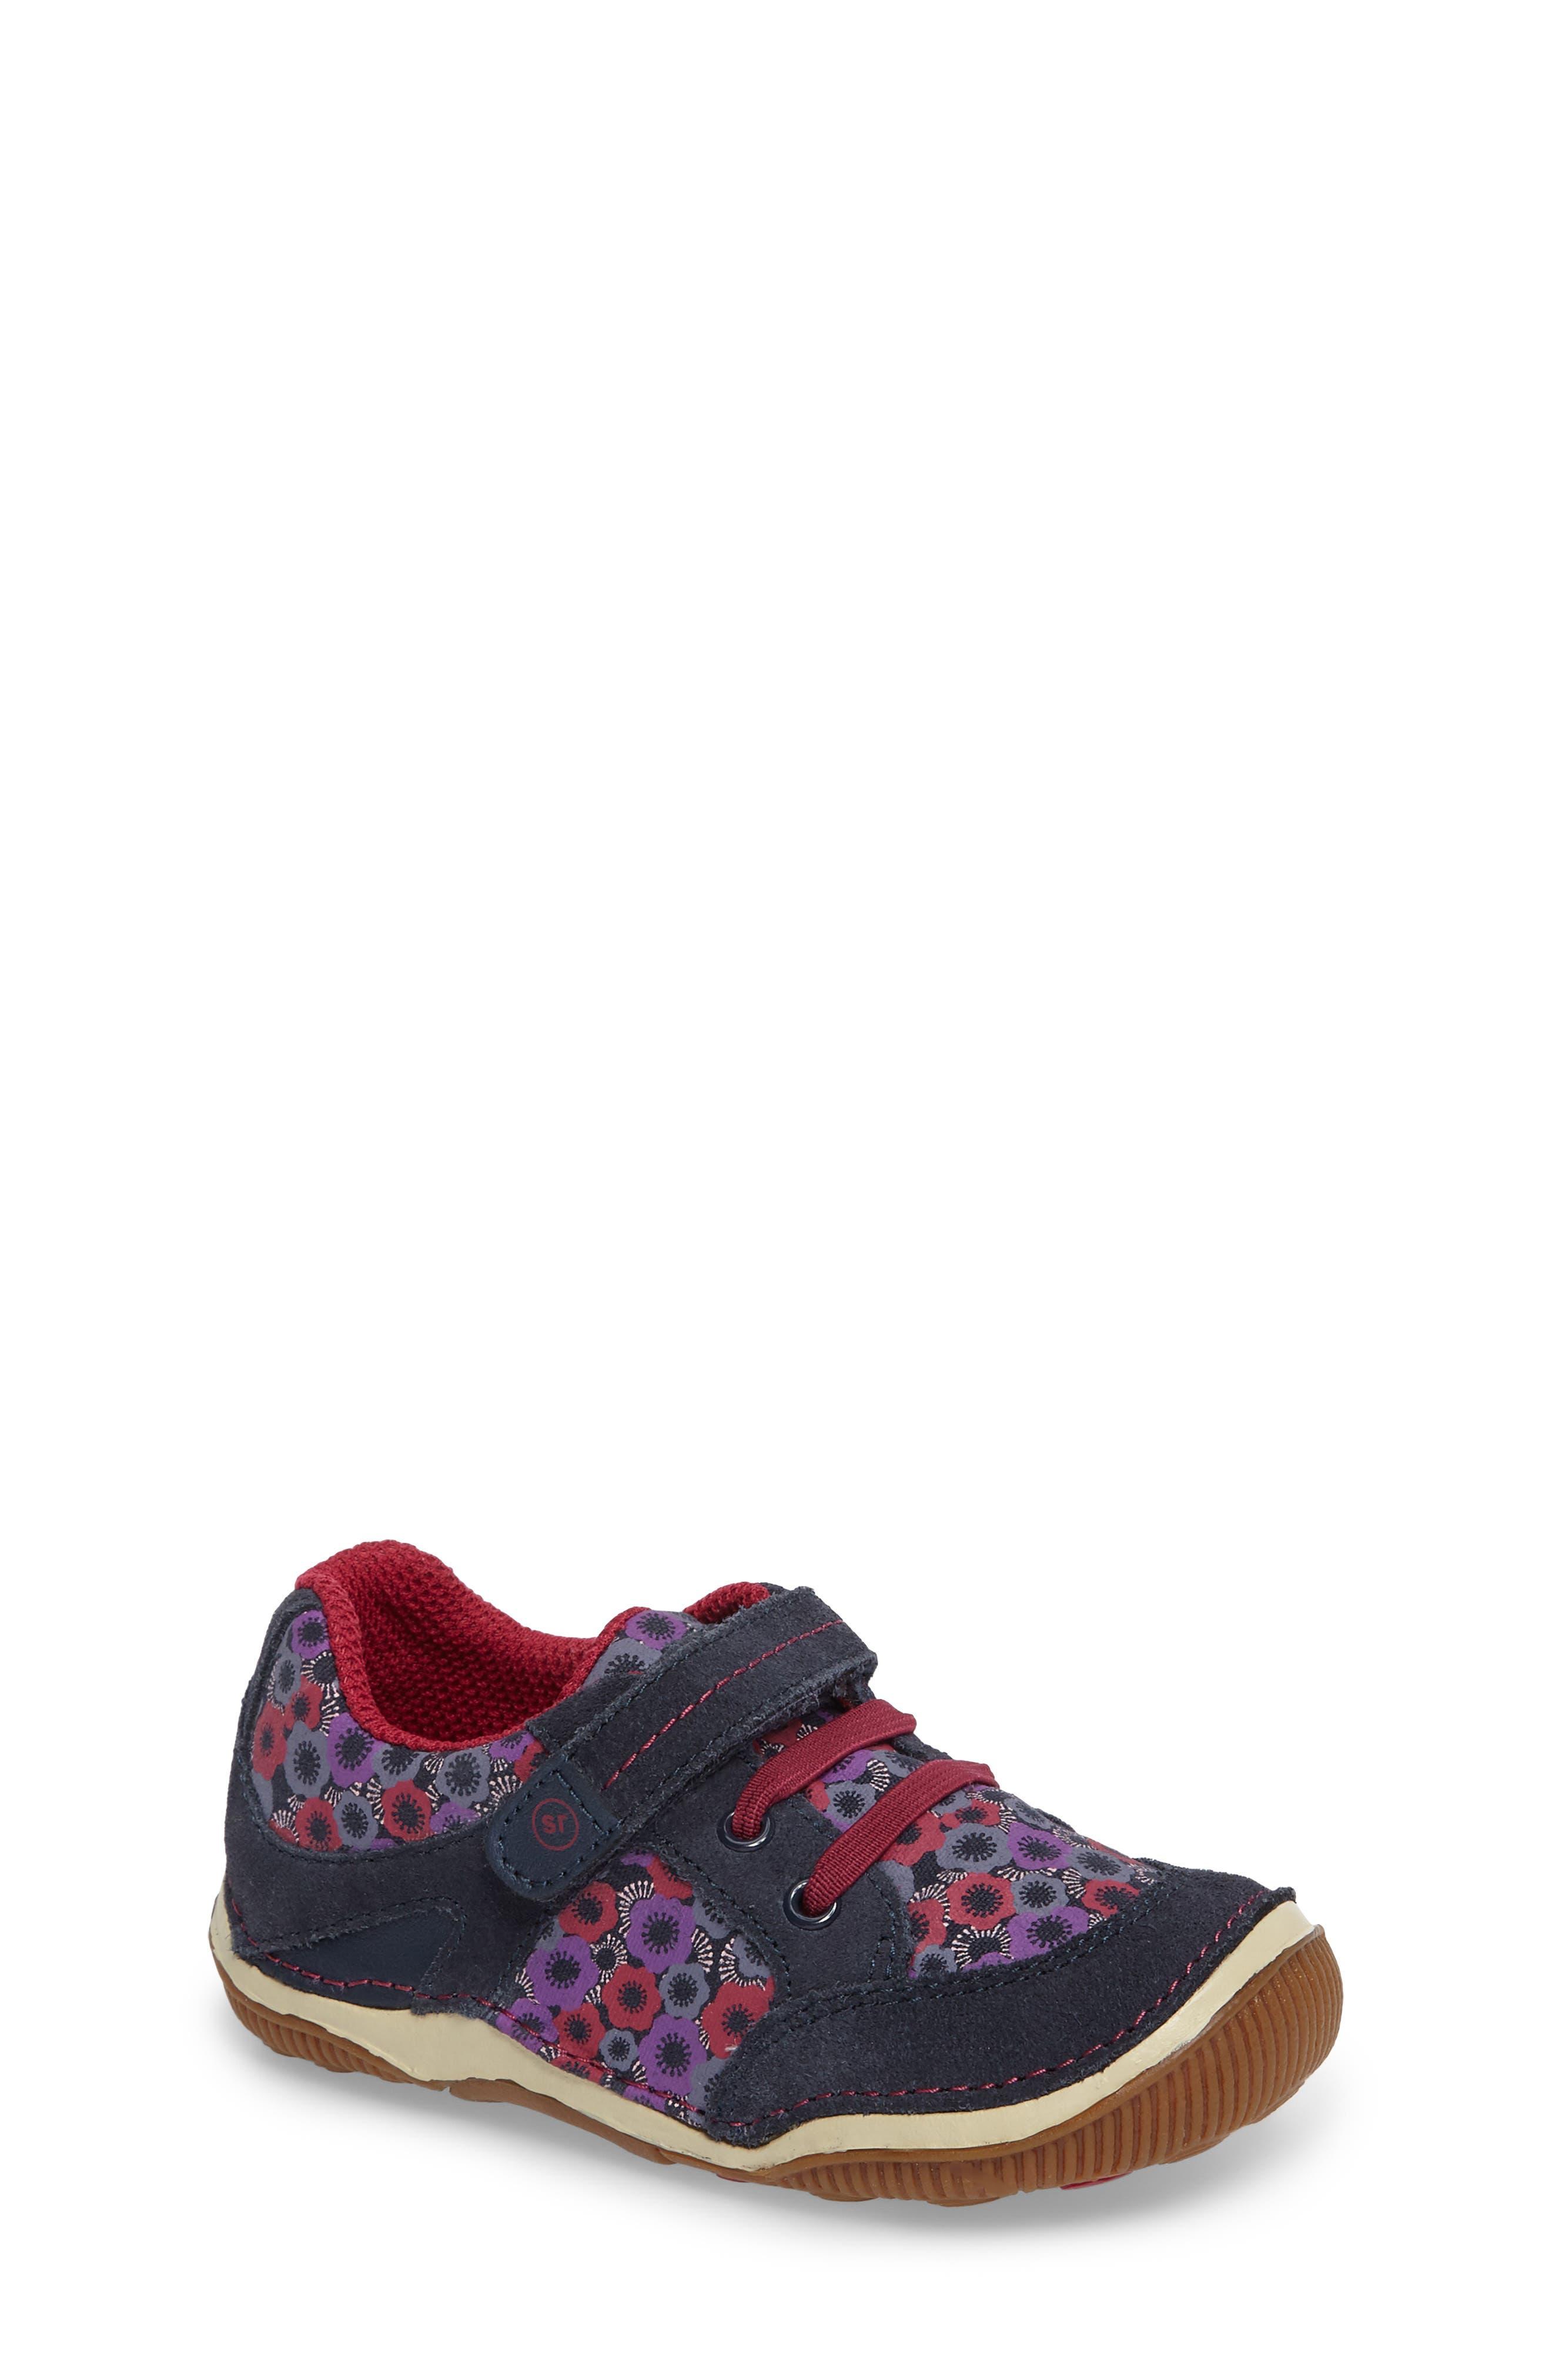 Armorie Flower Print Sneaker,                             Main thumbnail 1, color,                             410